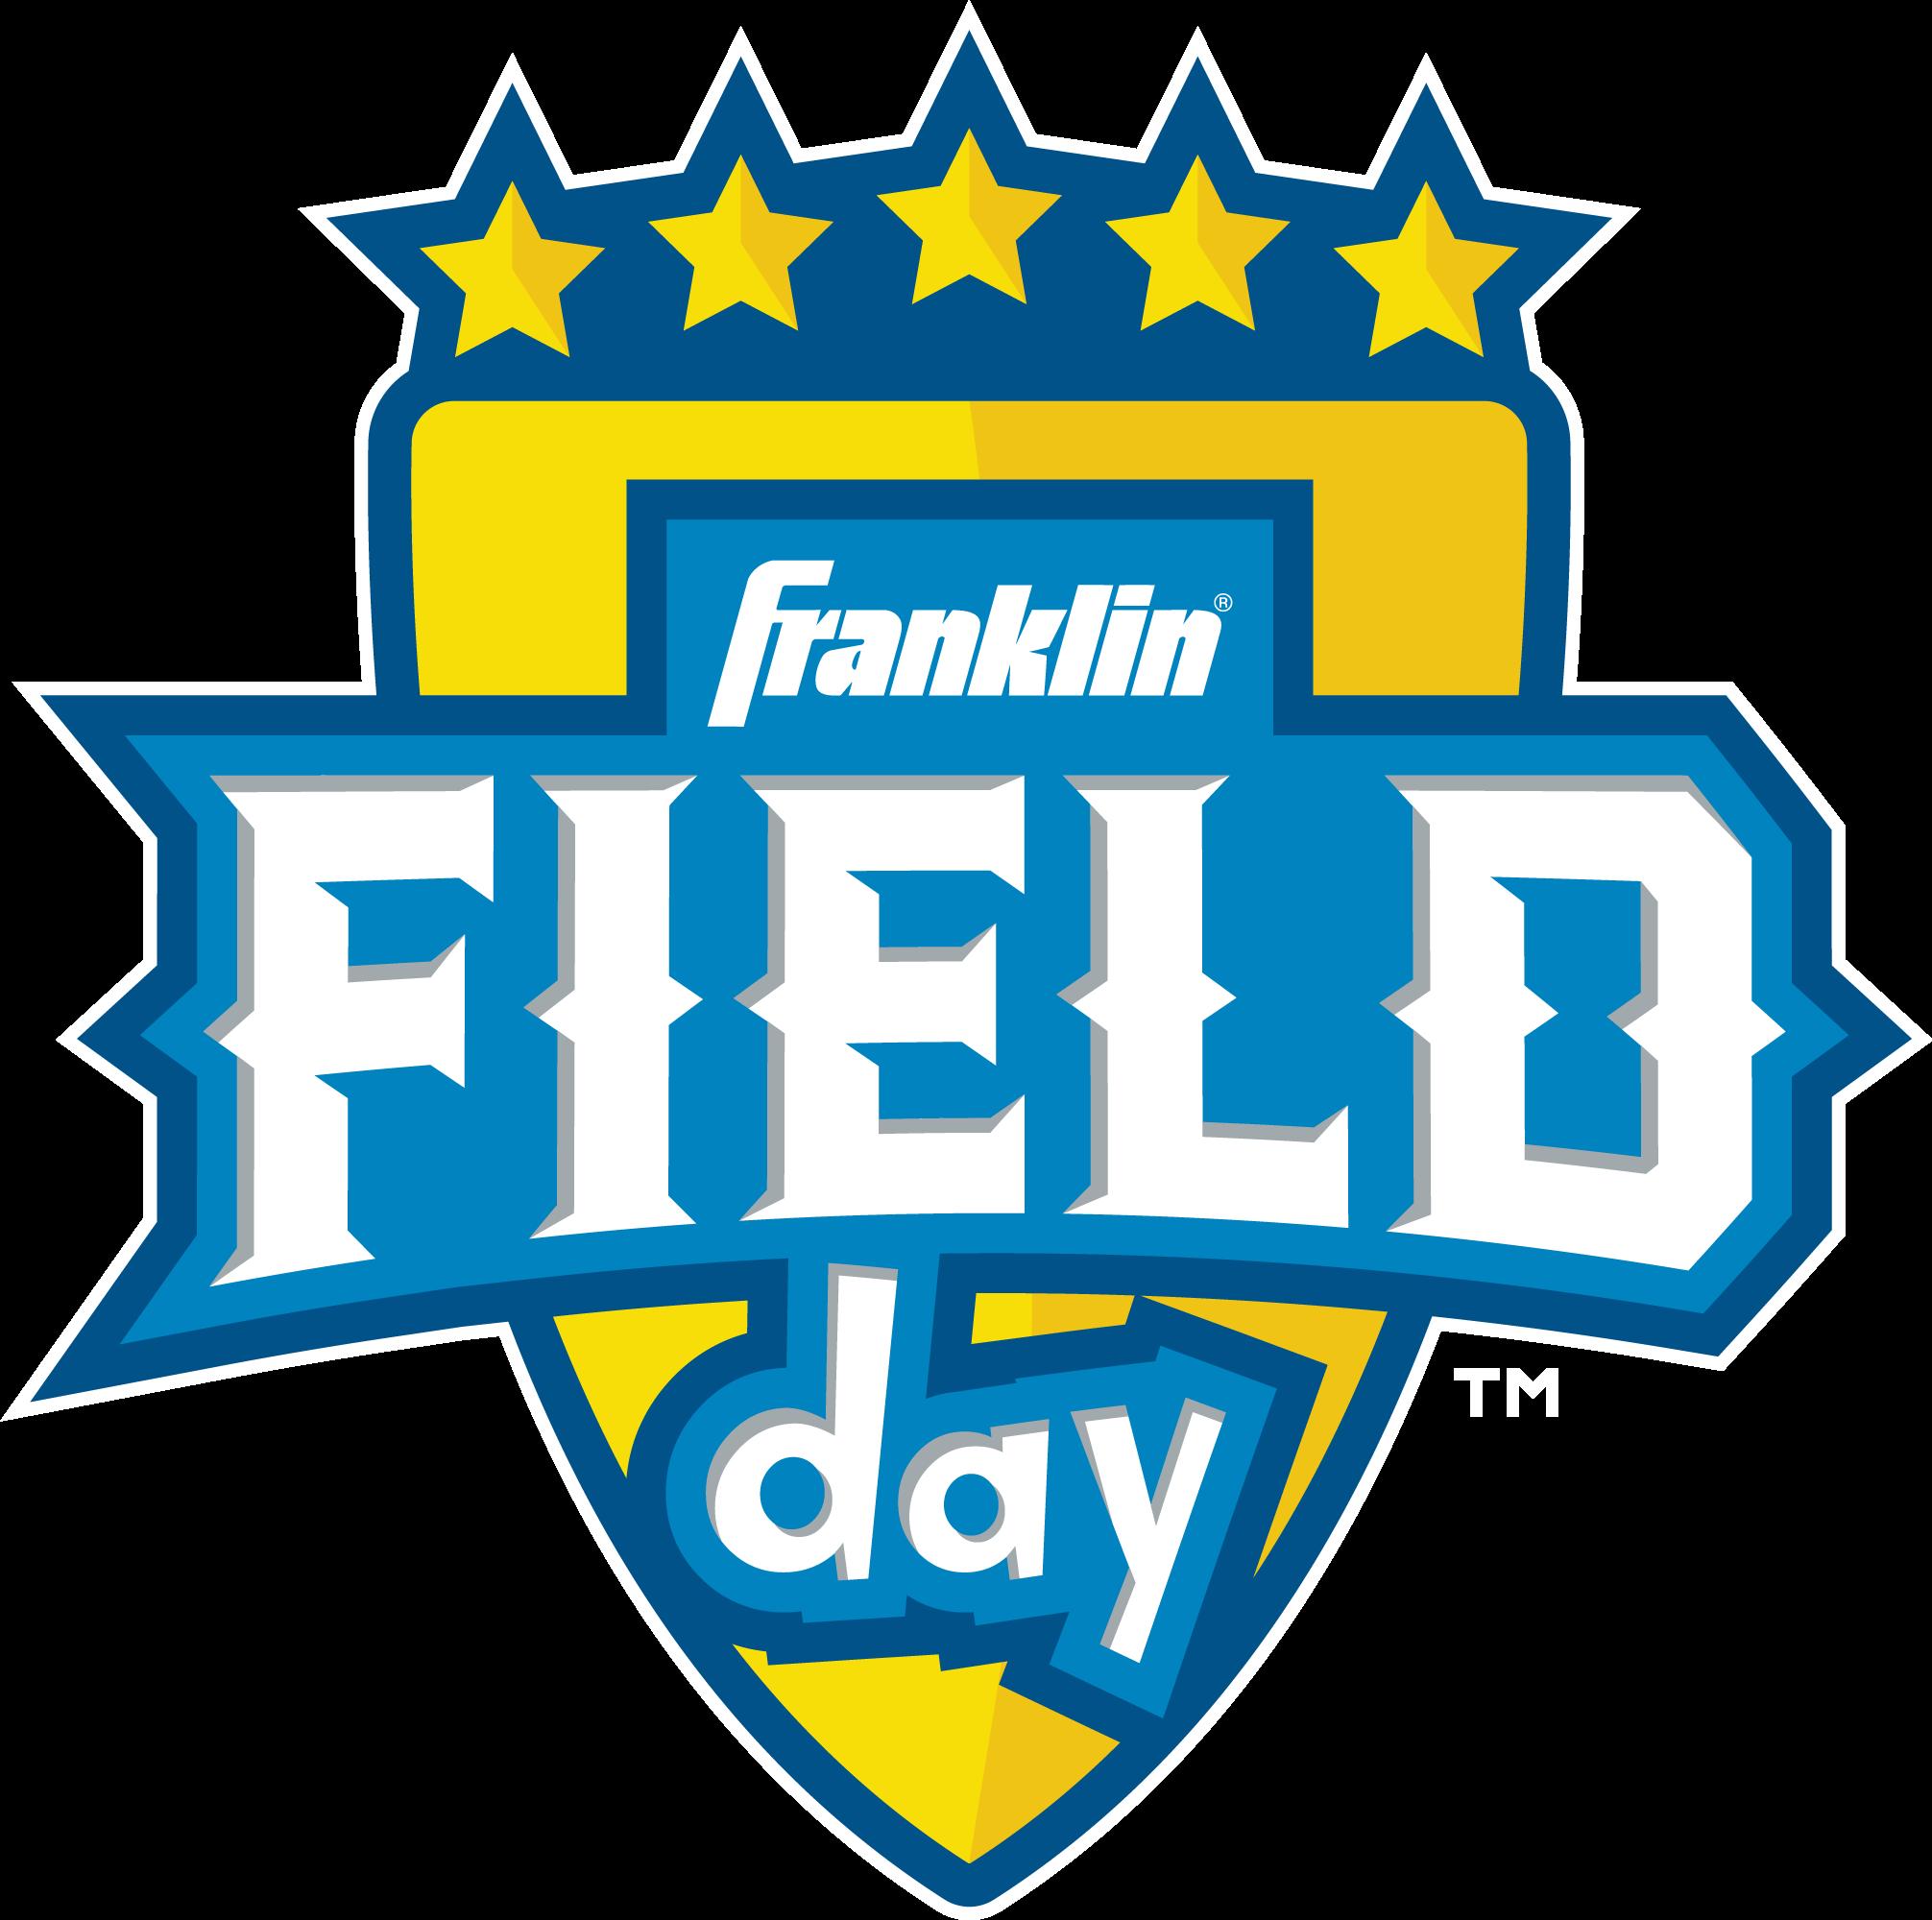 Franklin Field Day Logo